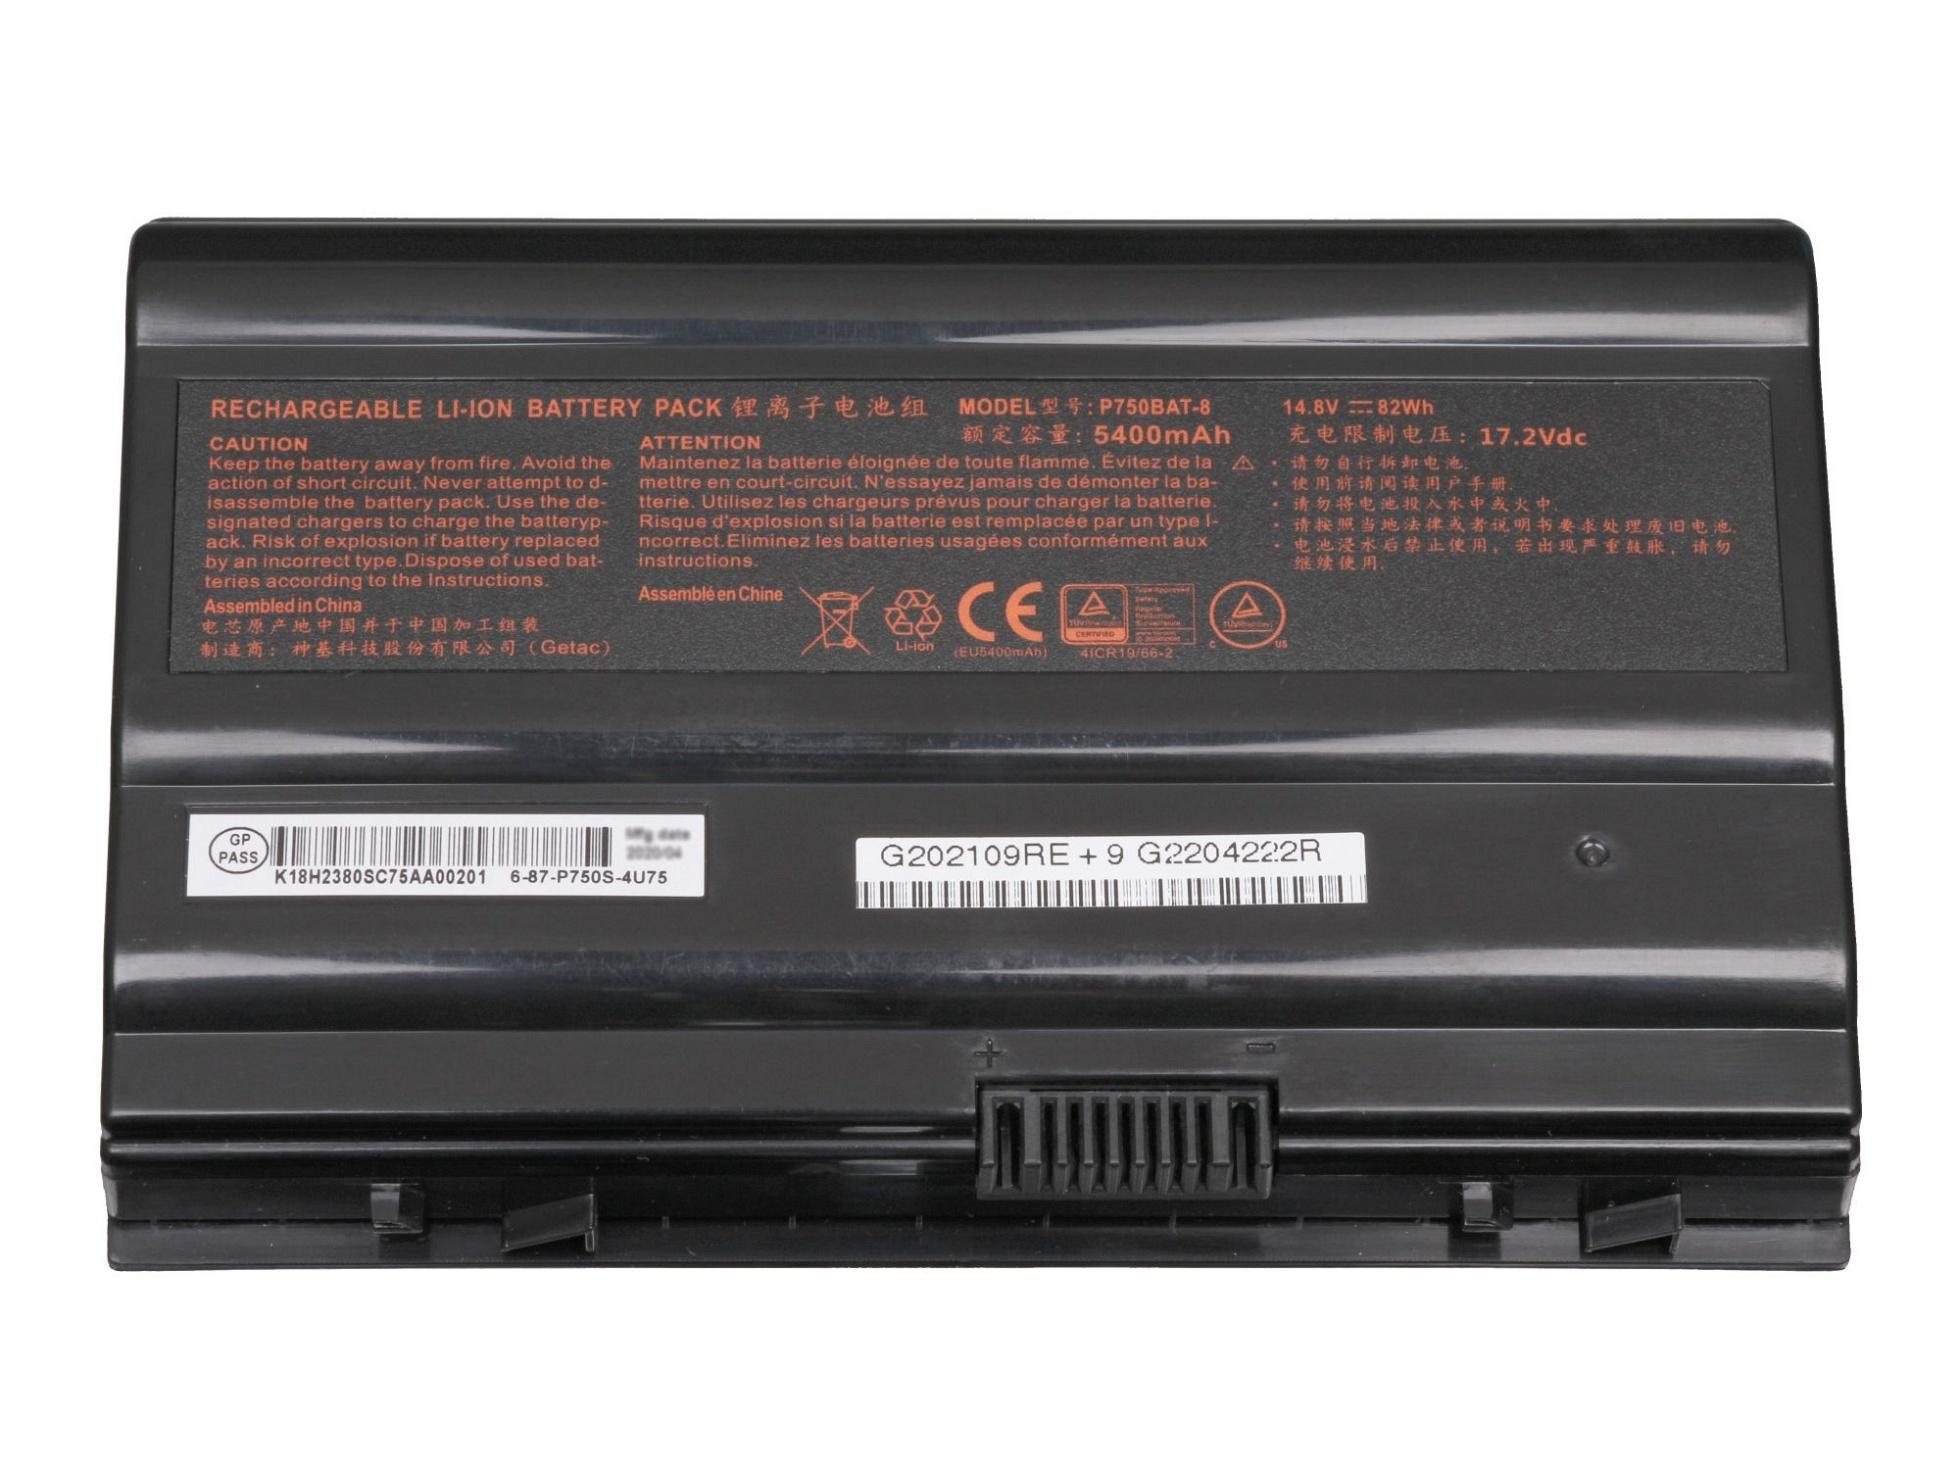 Akku Mifcom XG8 (P775DM) (ID: 2587)